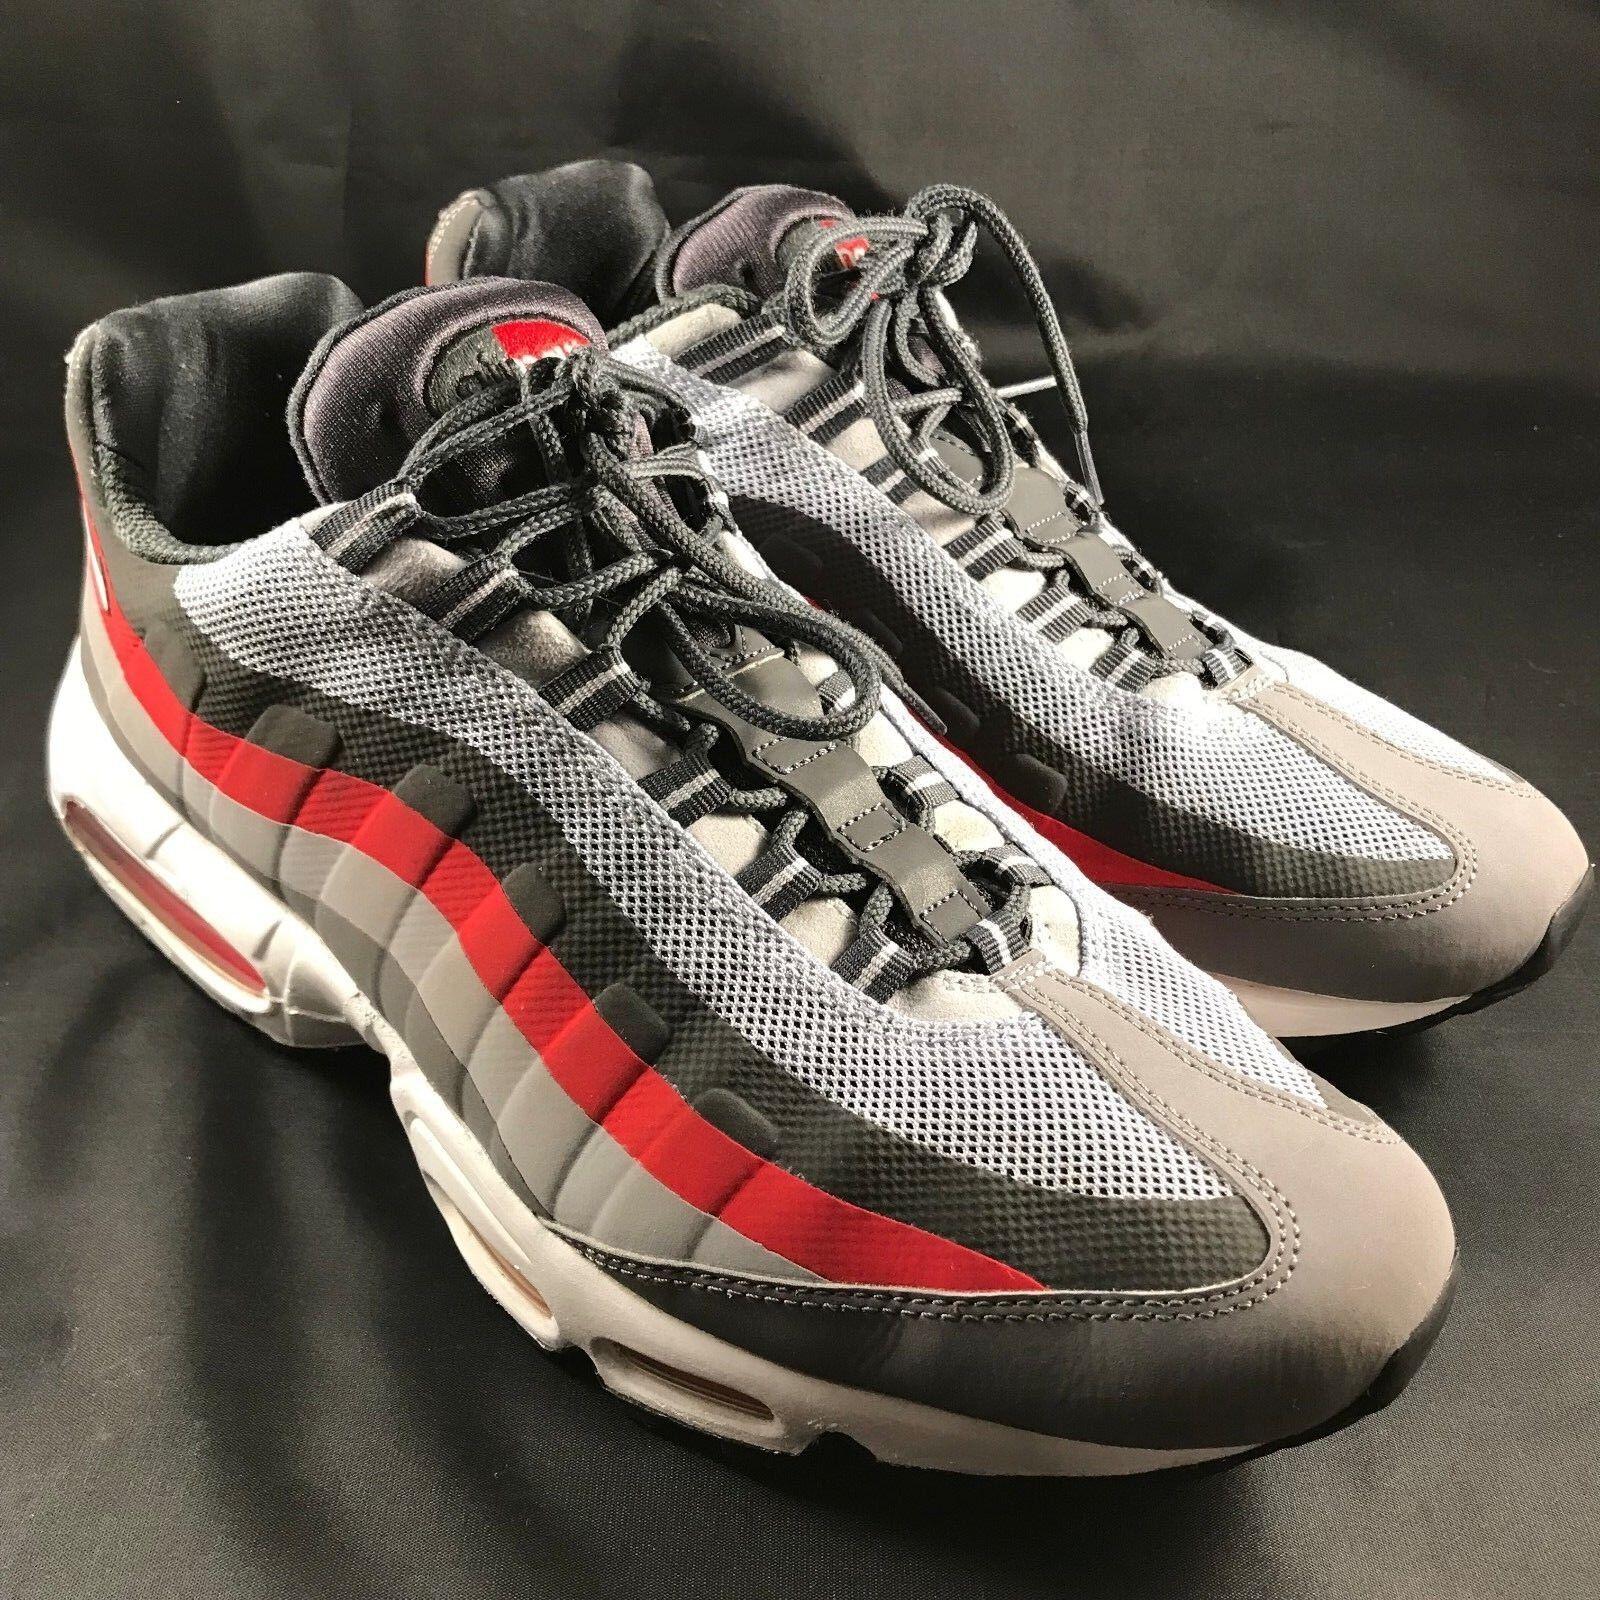 Men's sz 13 Nike Sew Air Max 95 No Sew Nike Dark Gray Challenge Red 616190-0006 Restored 7786de